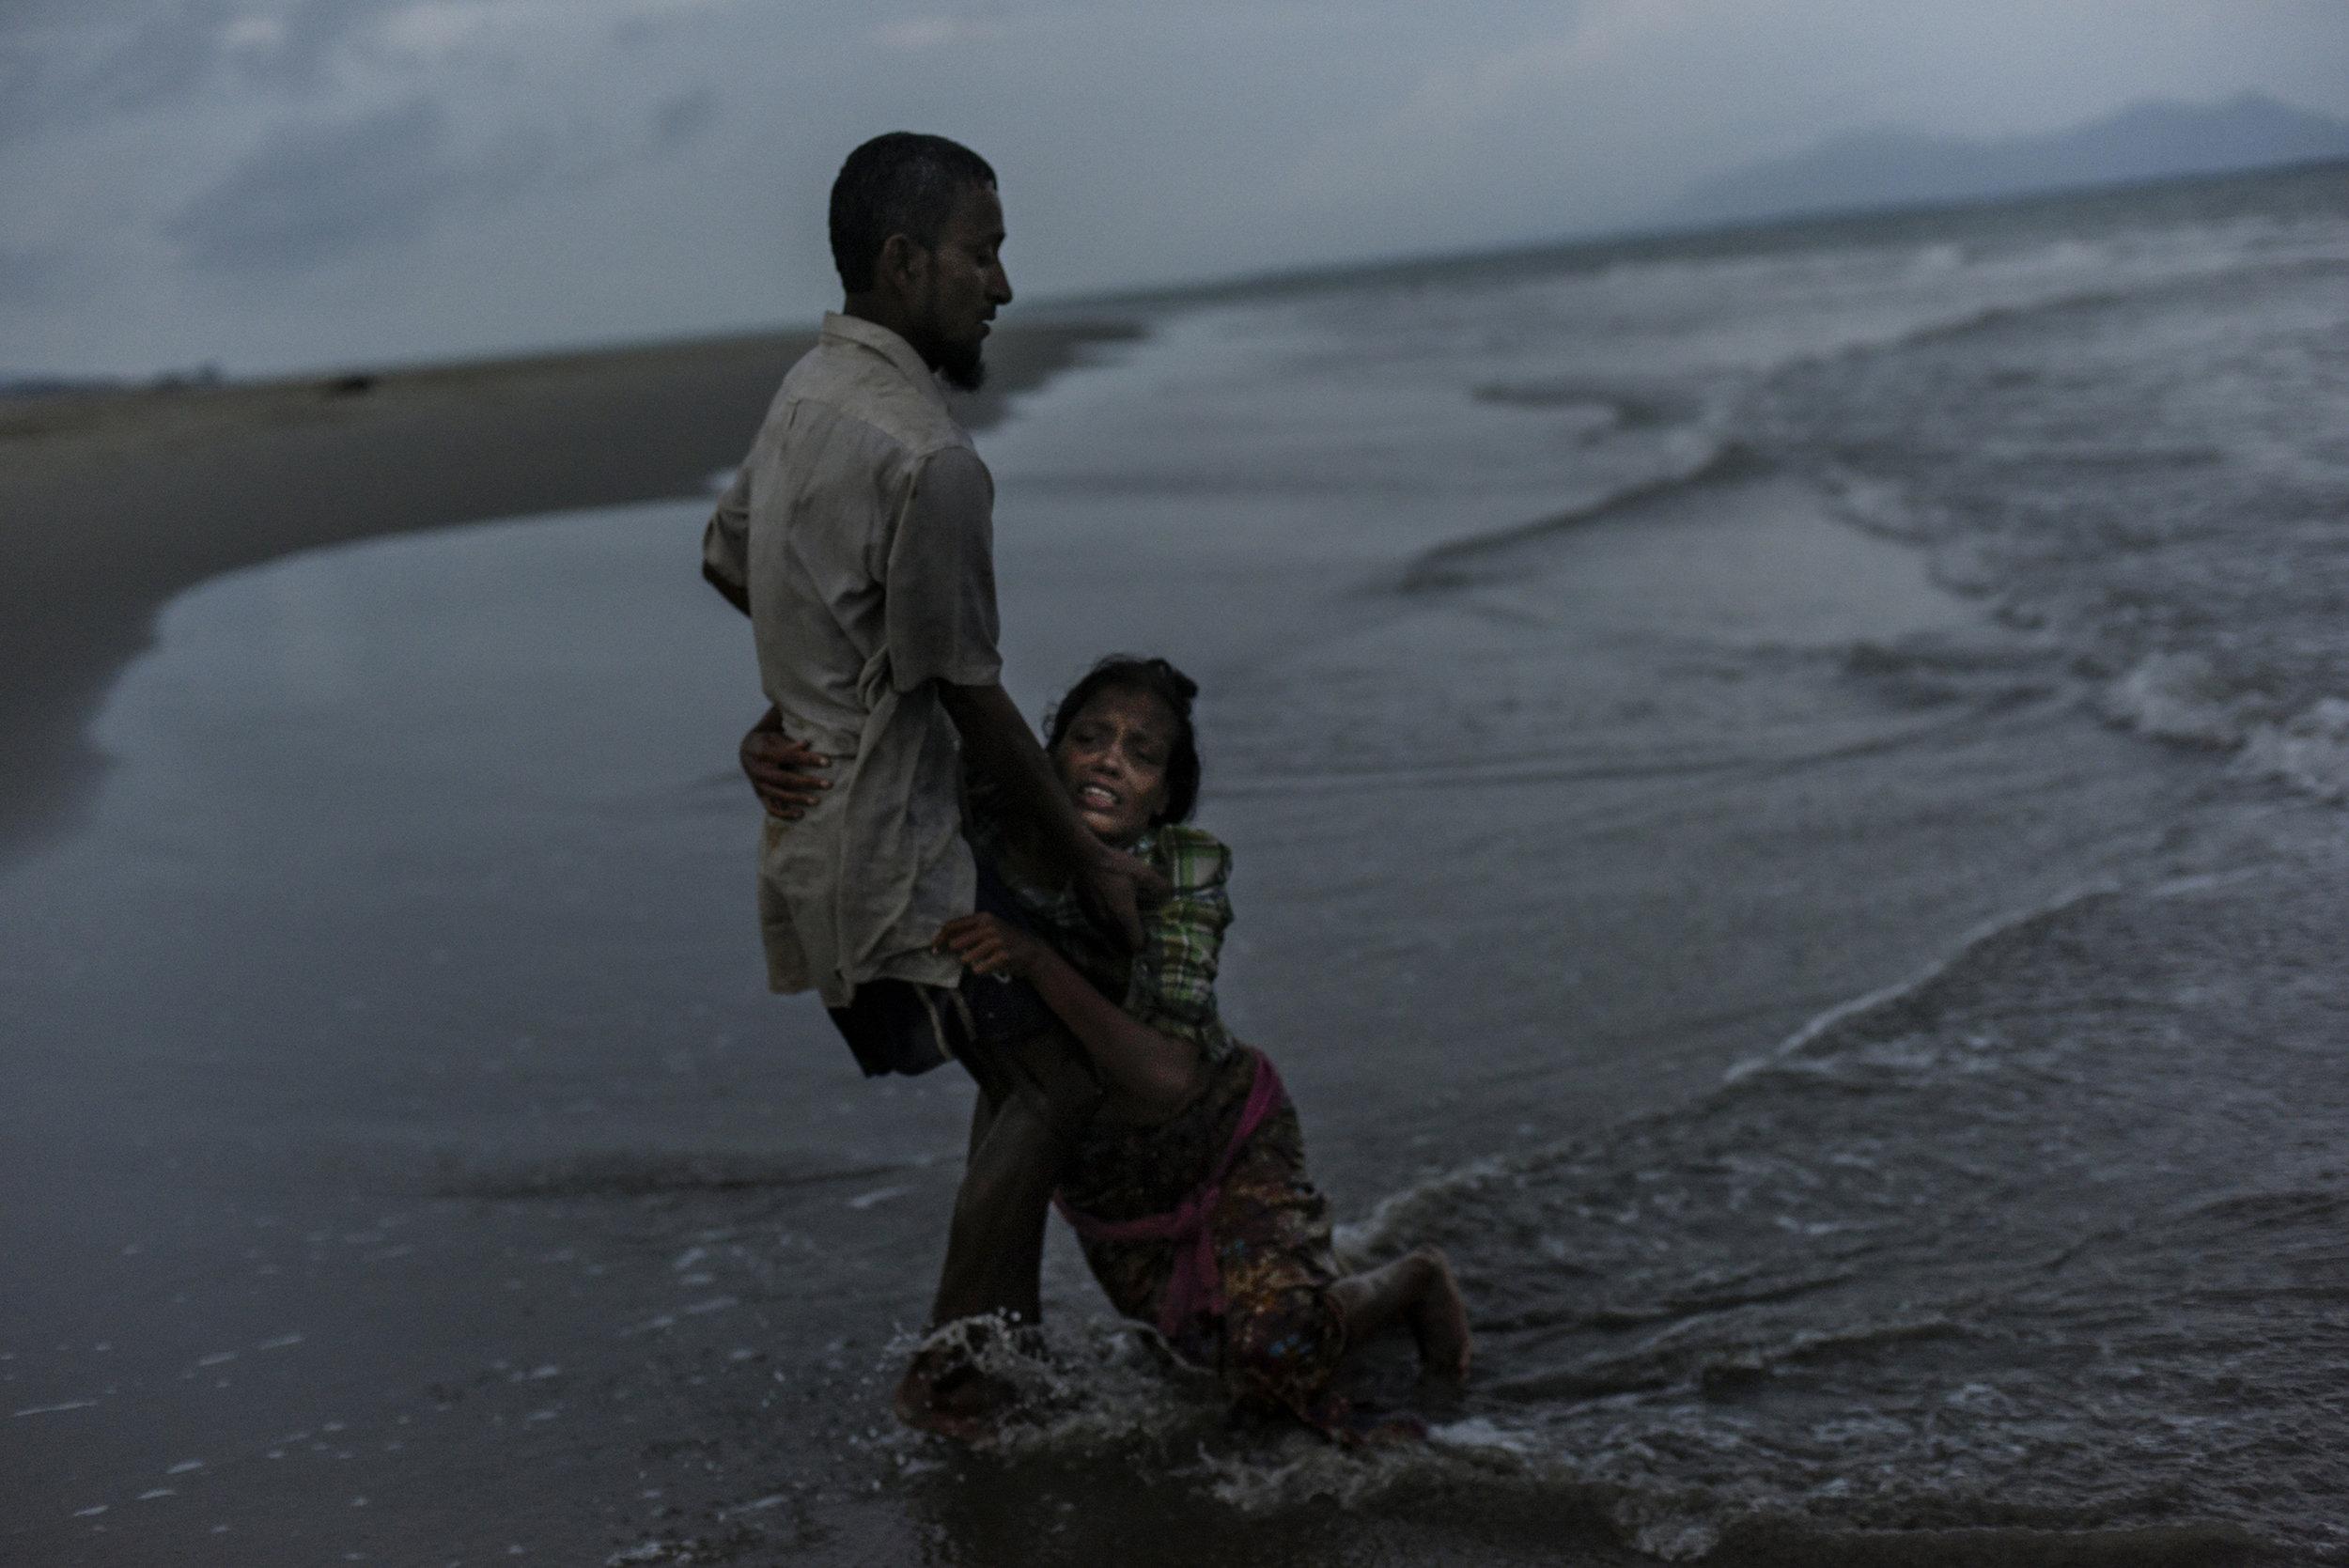 Shajida Khatun, a Rohingya refugee arrived in Shahporir Island by boat from Myanmar.